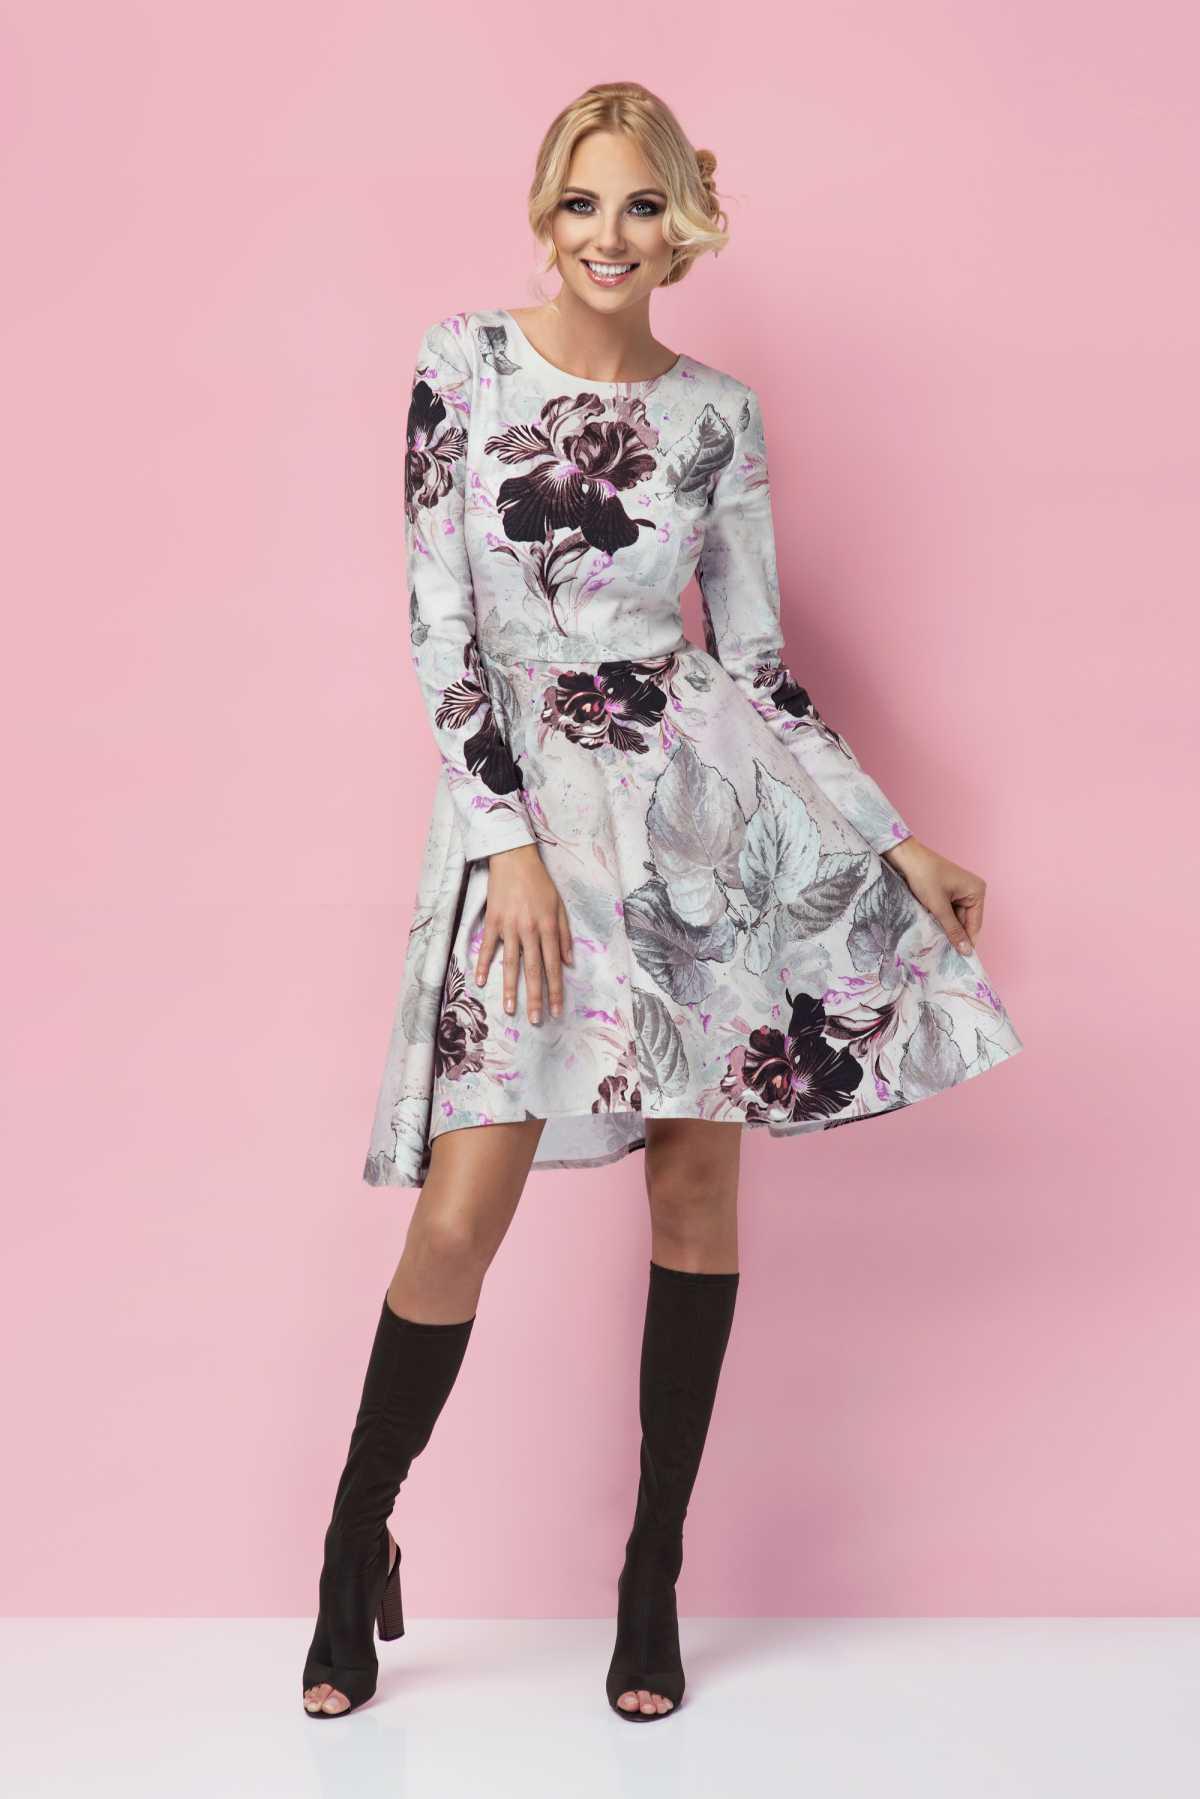 vestido floral é tendência neste inverno